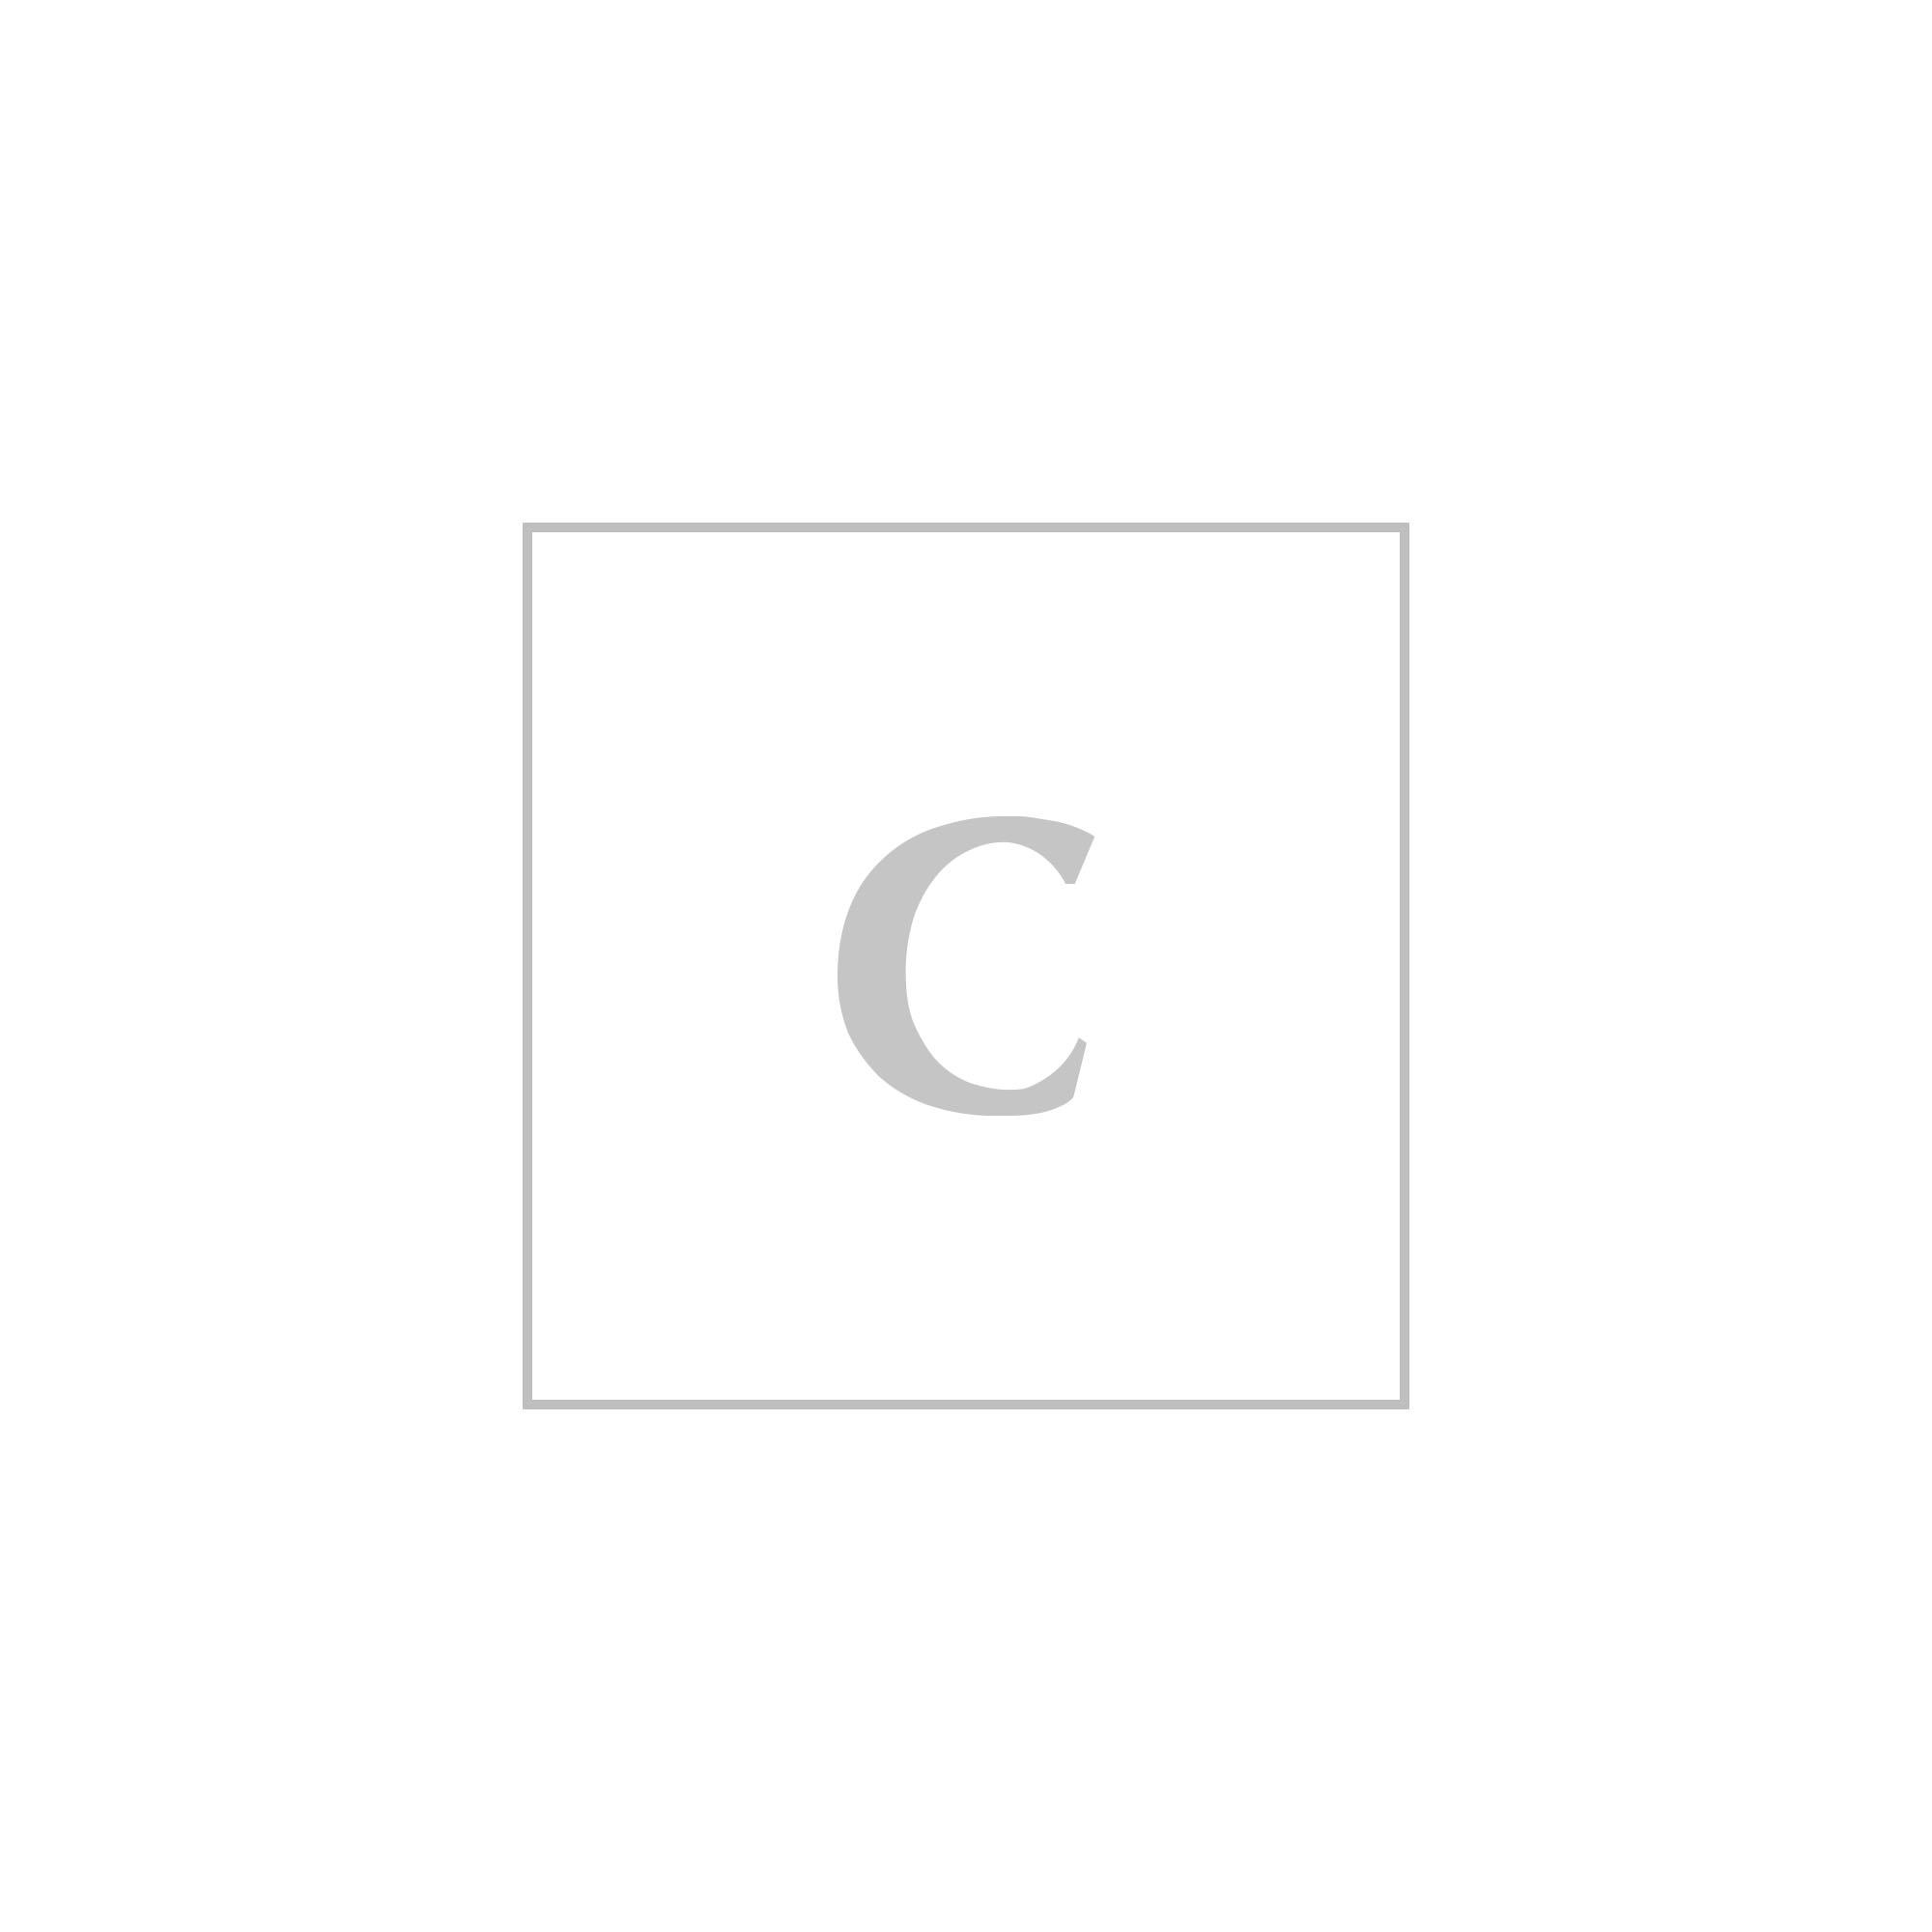 burberry abbigliamento donna camicia carlota